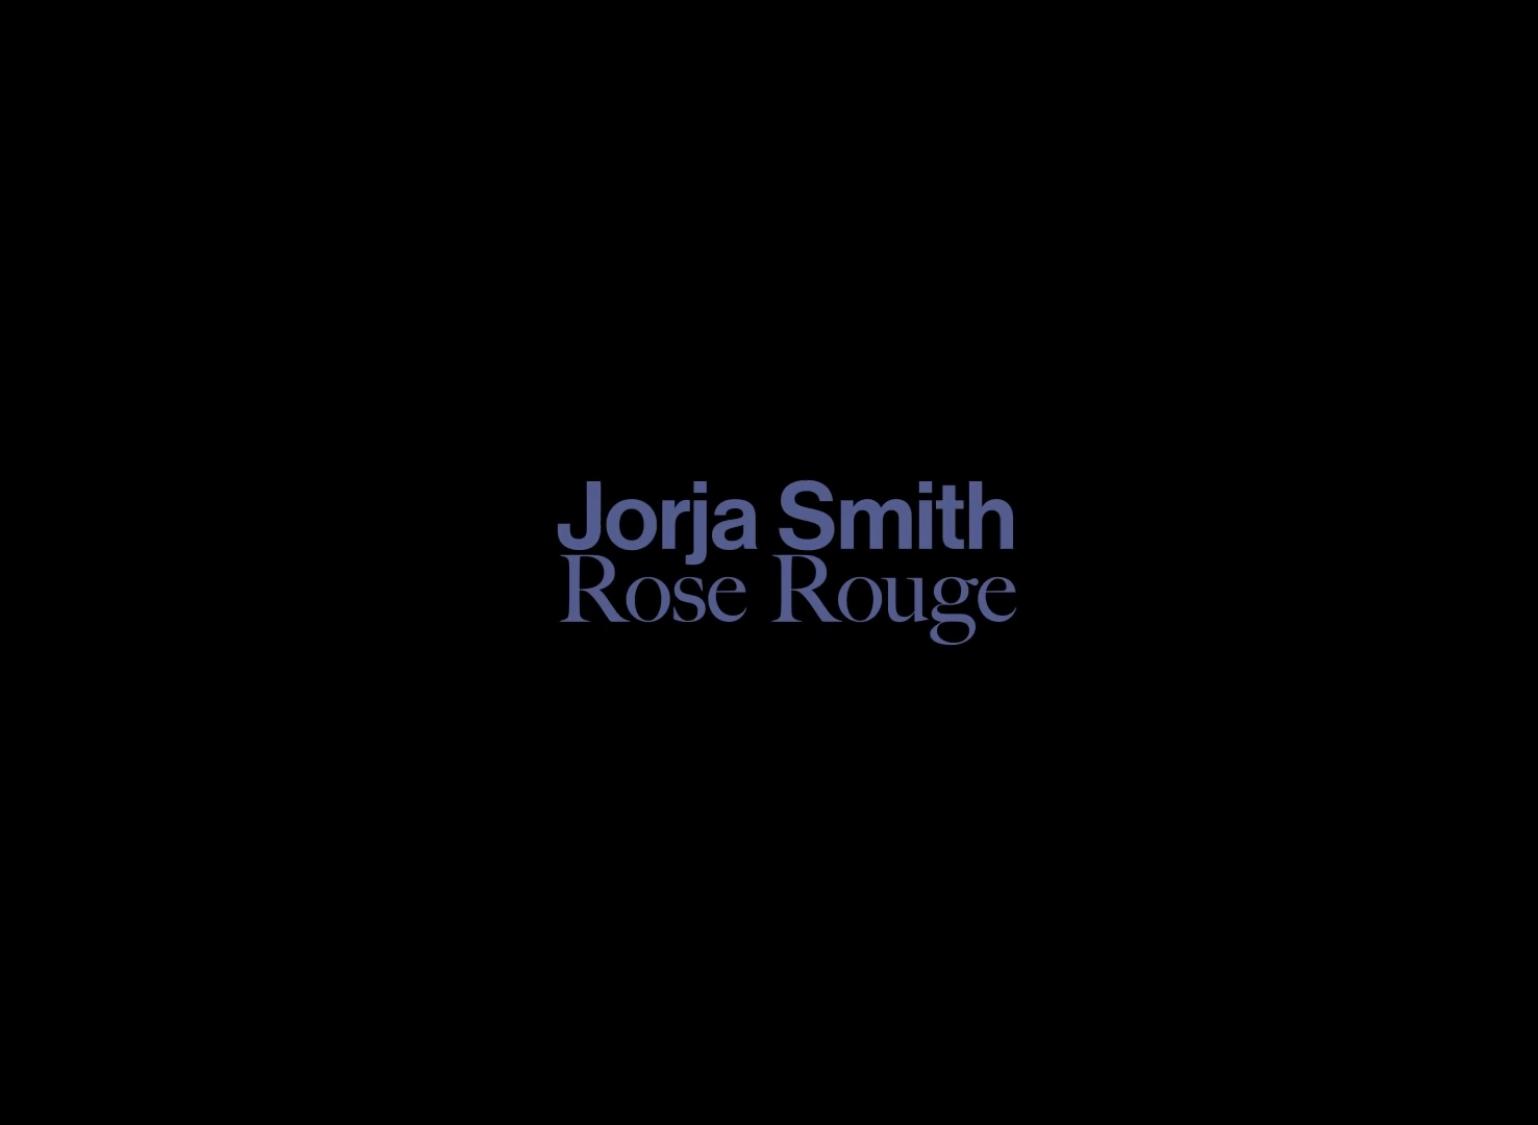 Jorja Smith - Rose Rouge | Video